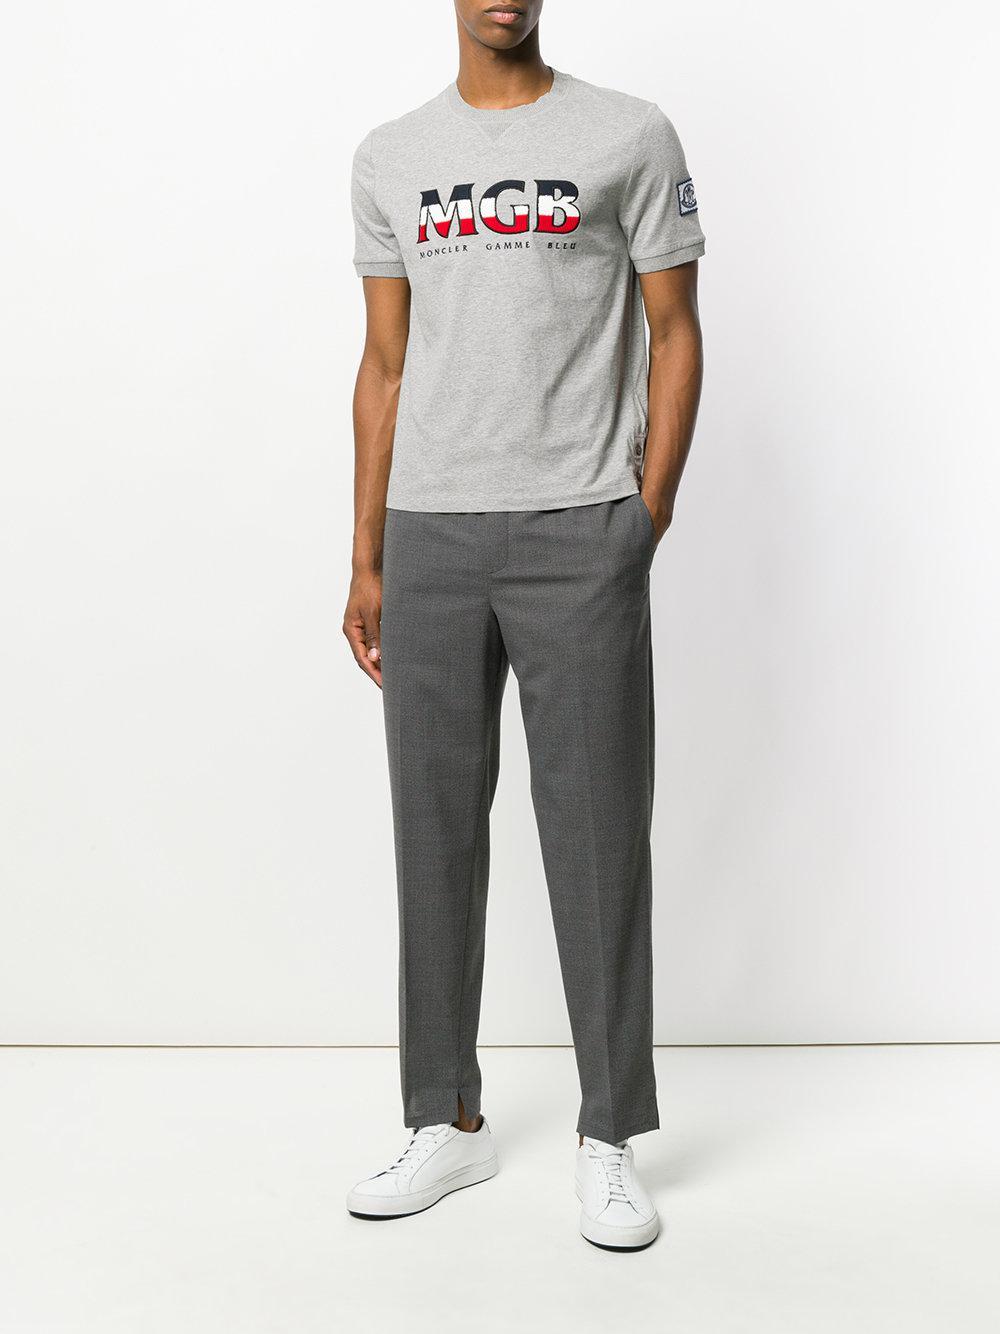 7c22d7039 Lyst - Moncler Logo Print Sweatshirt T-shirt in Gray for Men